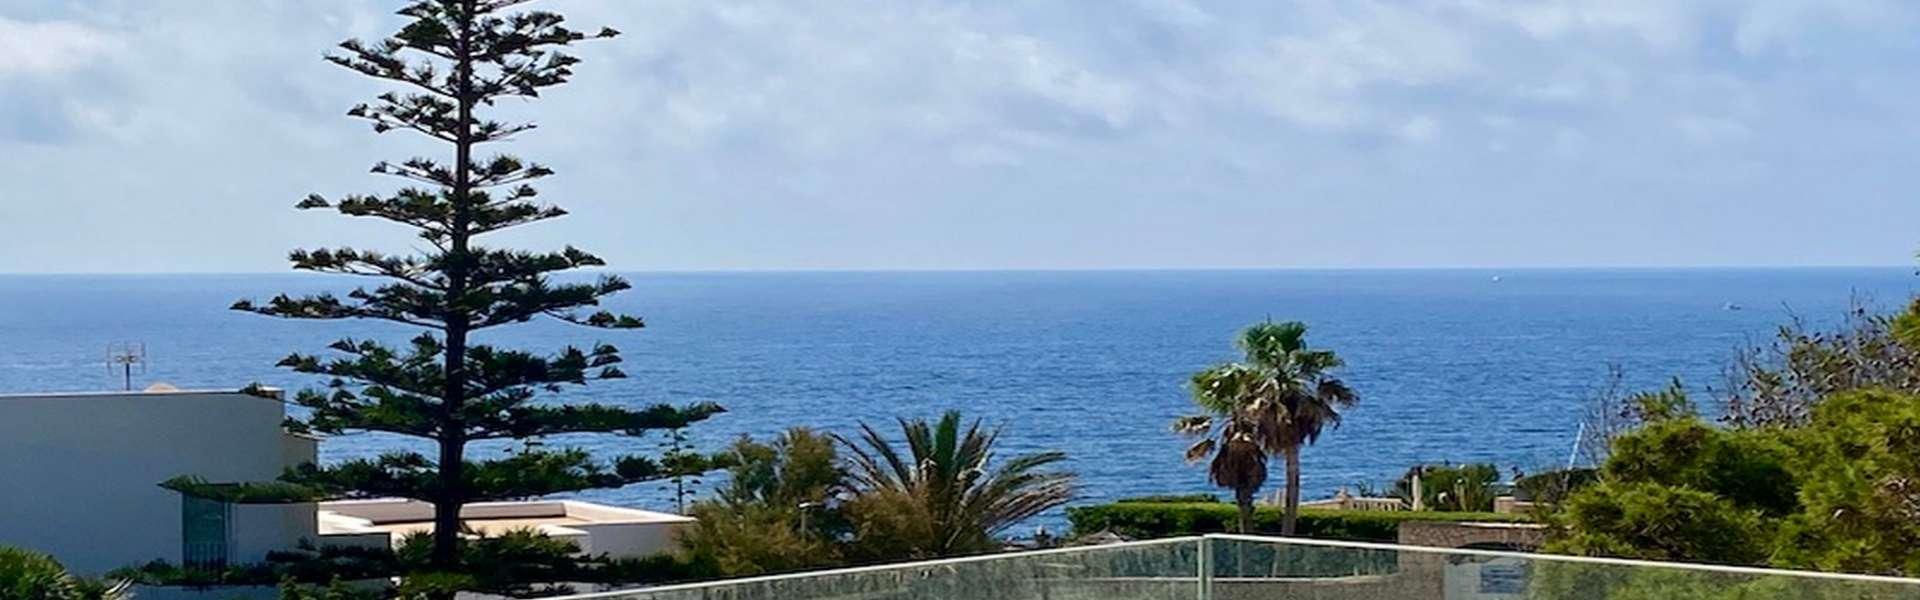 New construction villa with sea view in Cala d'Or/Cala Serena